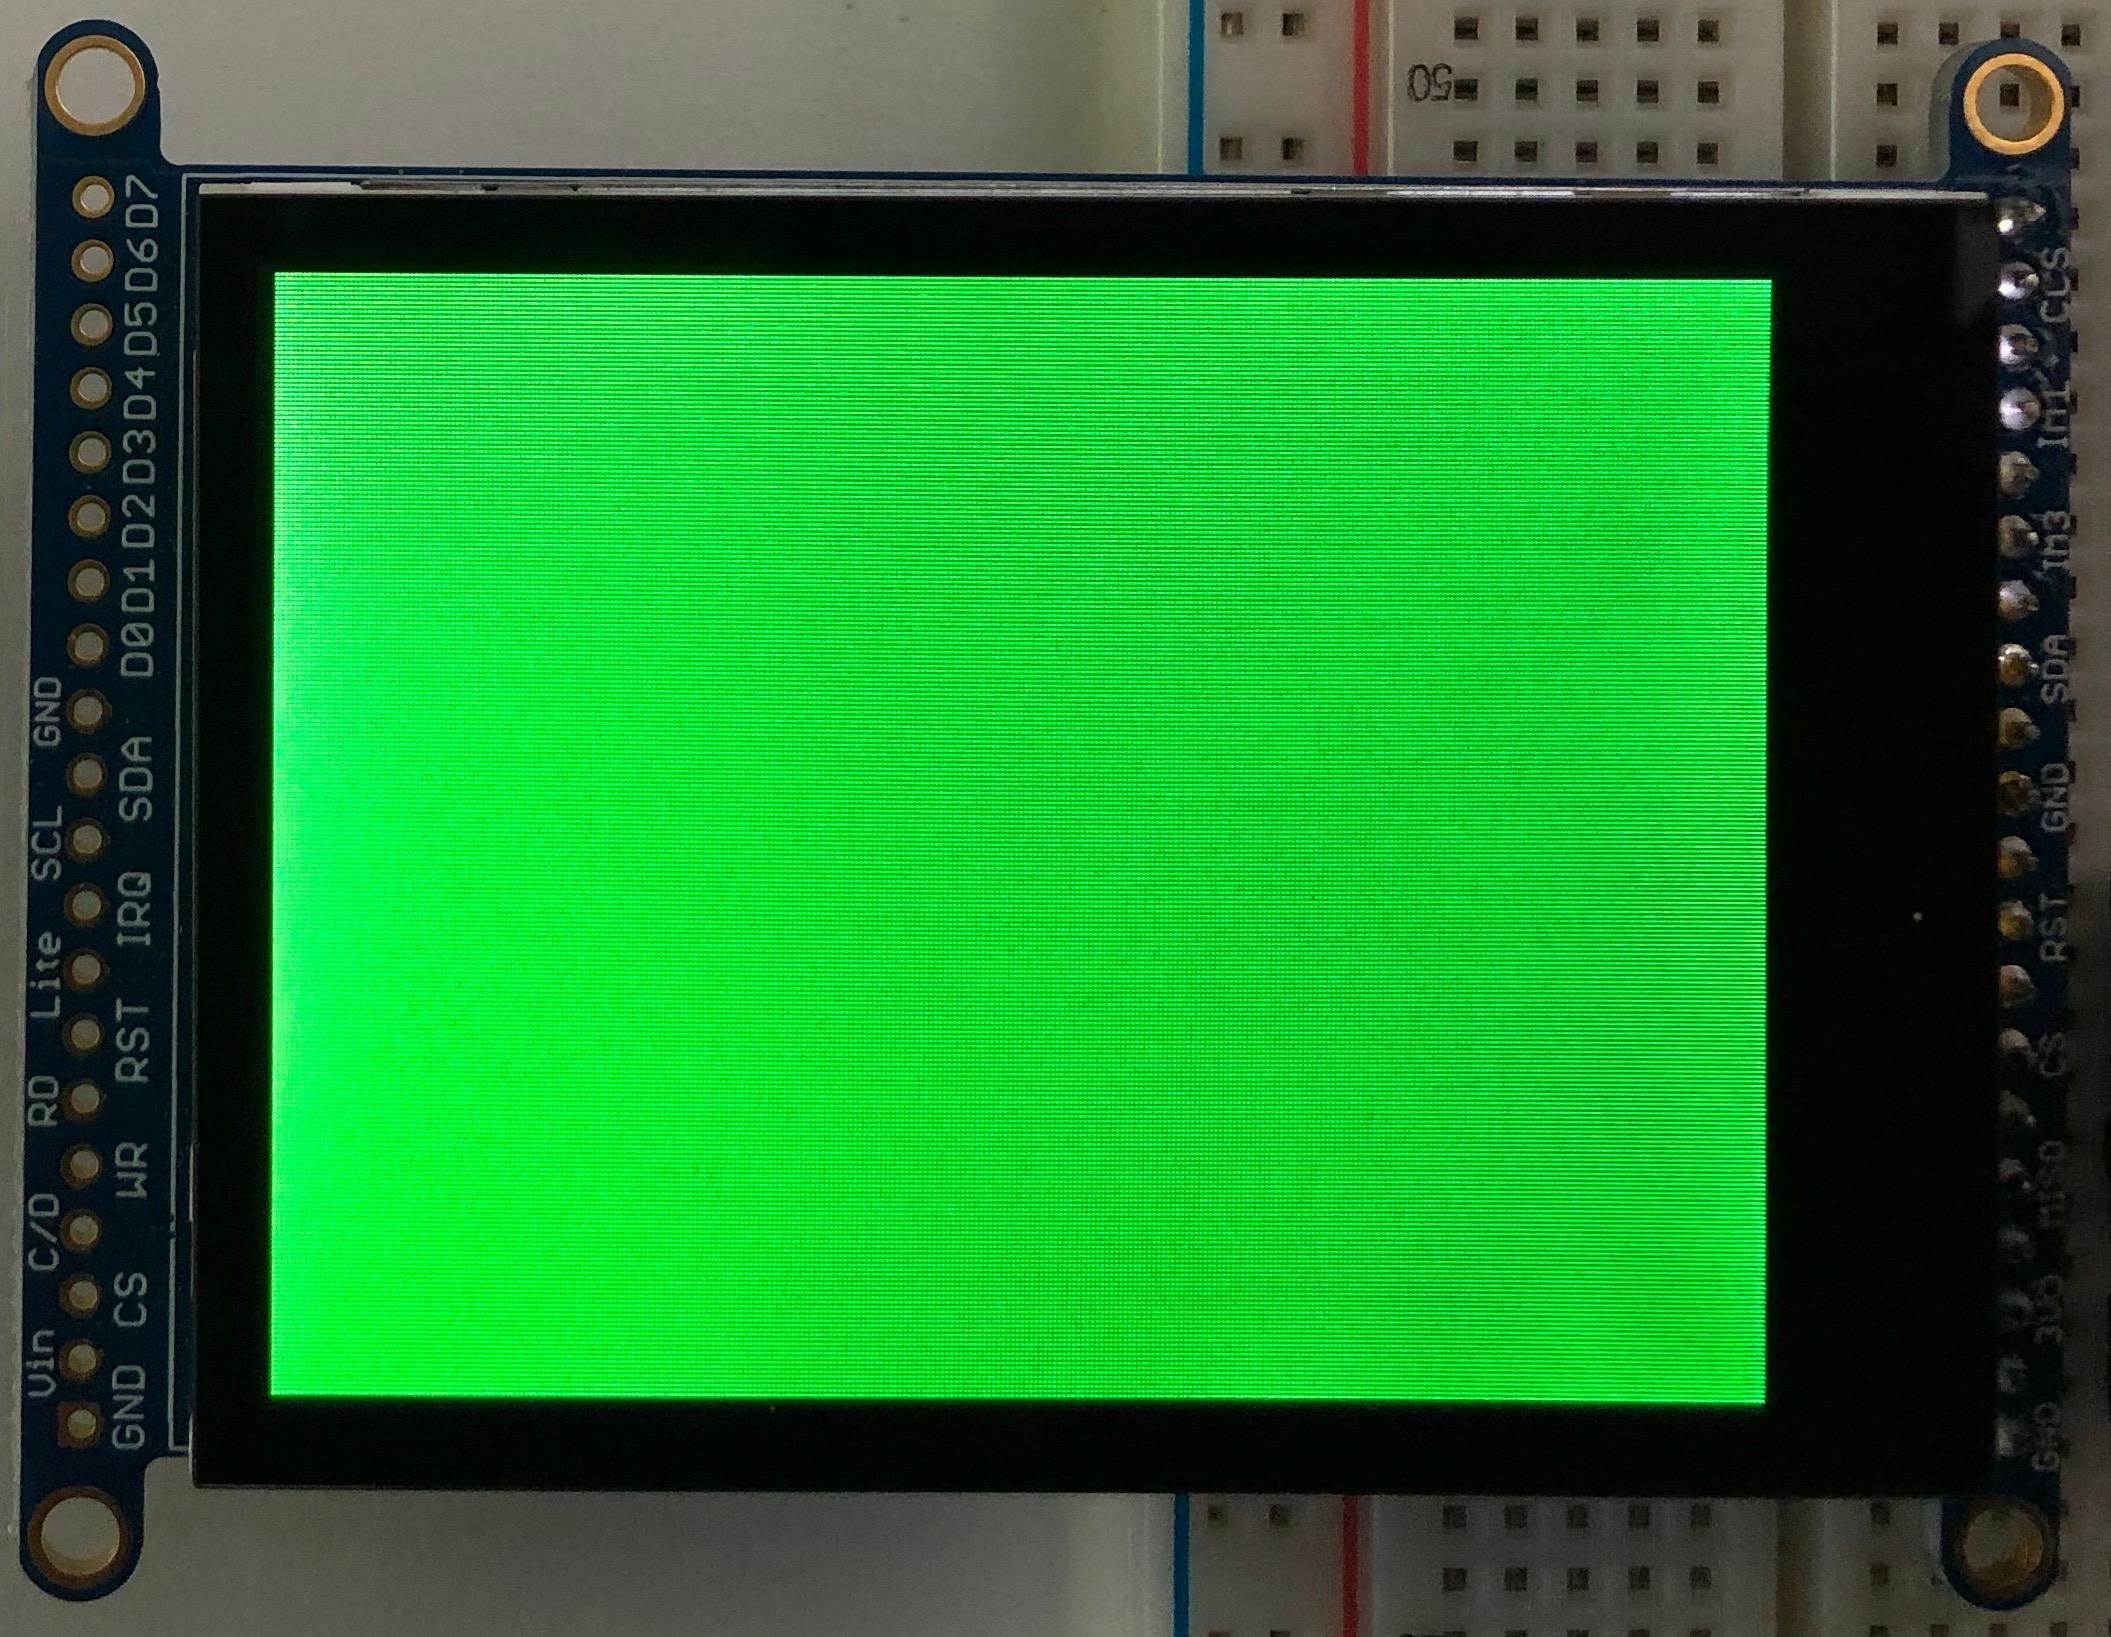 adafruit_products_2.8-green.jpeg